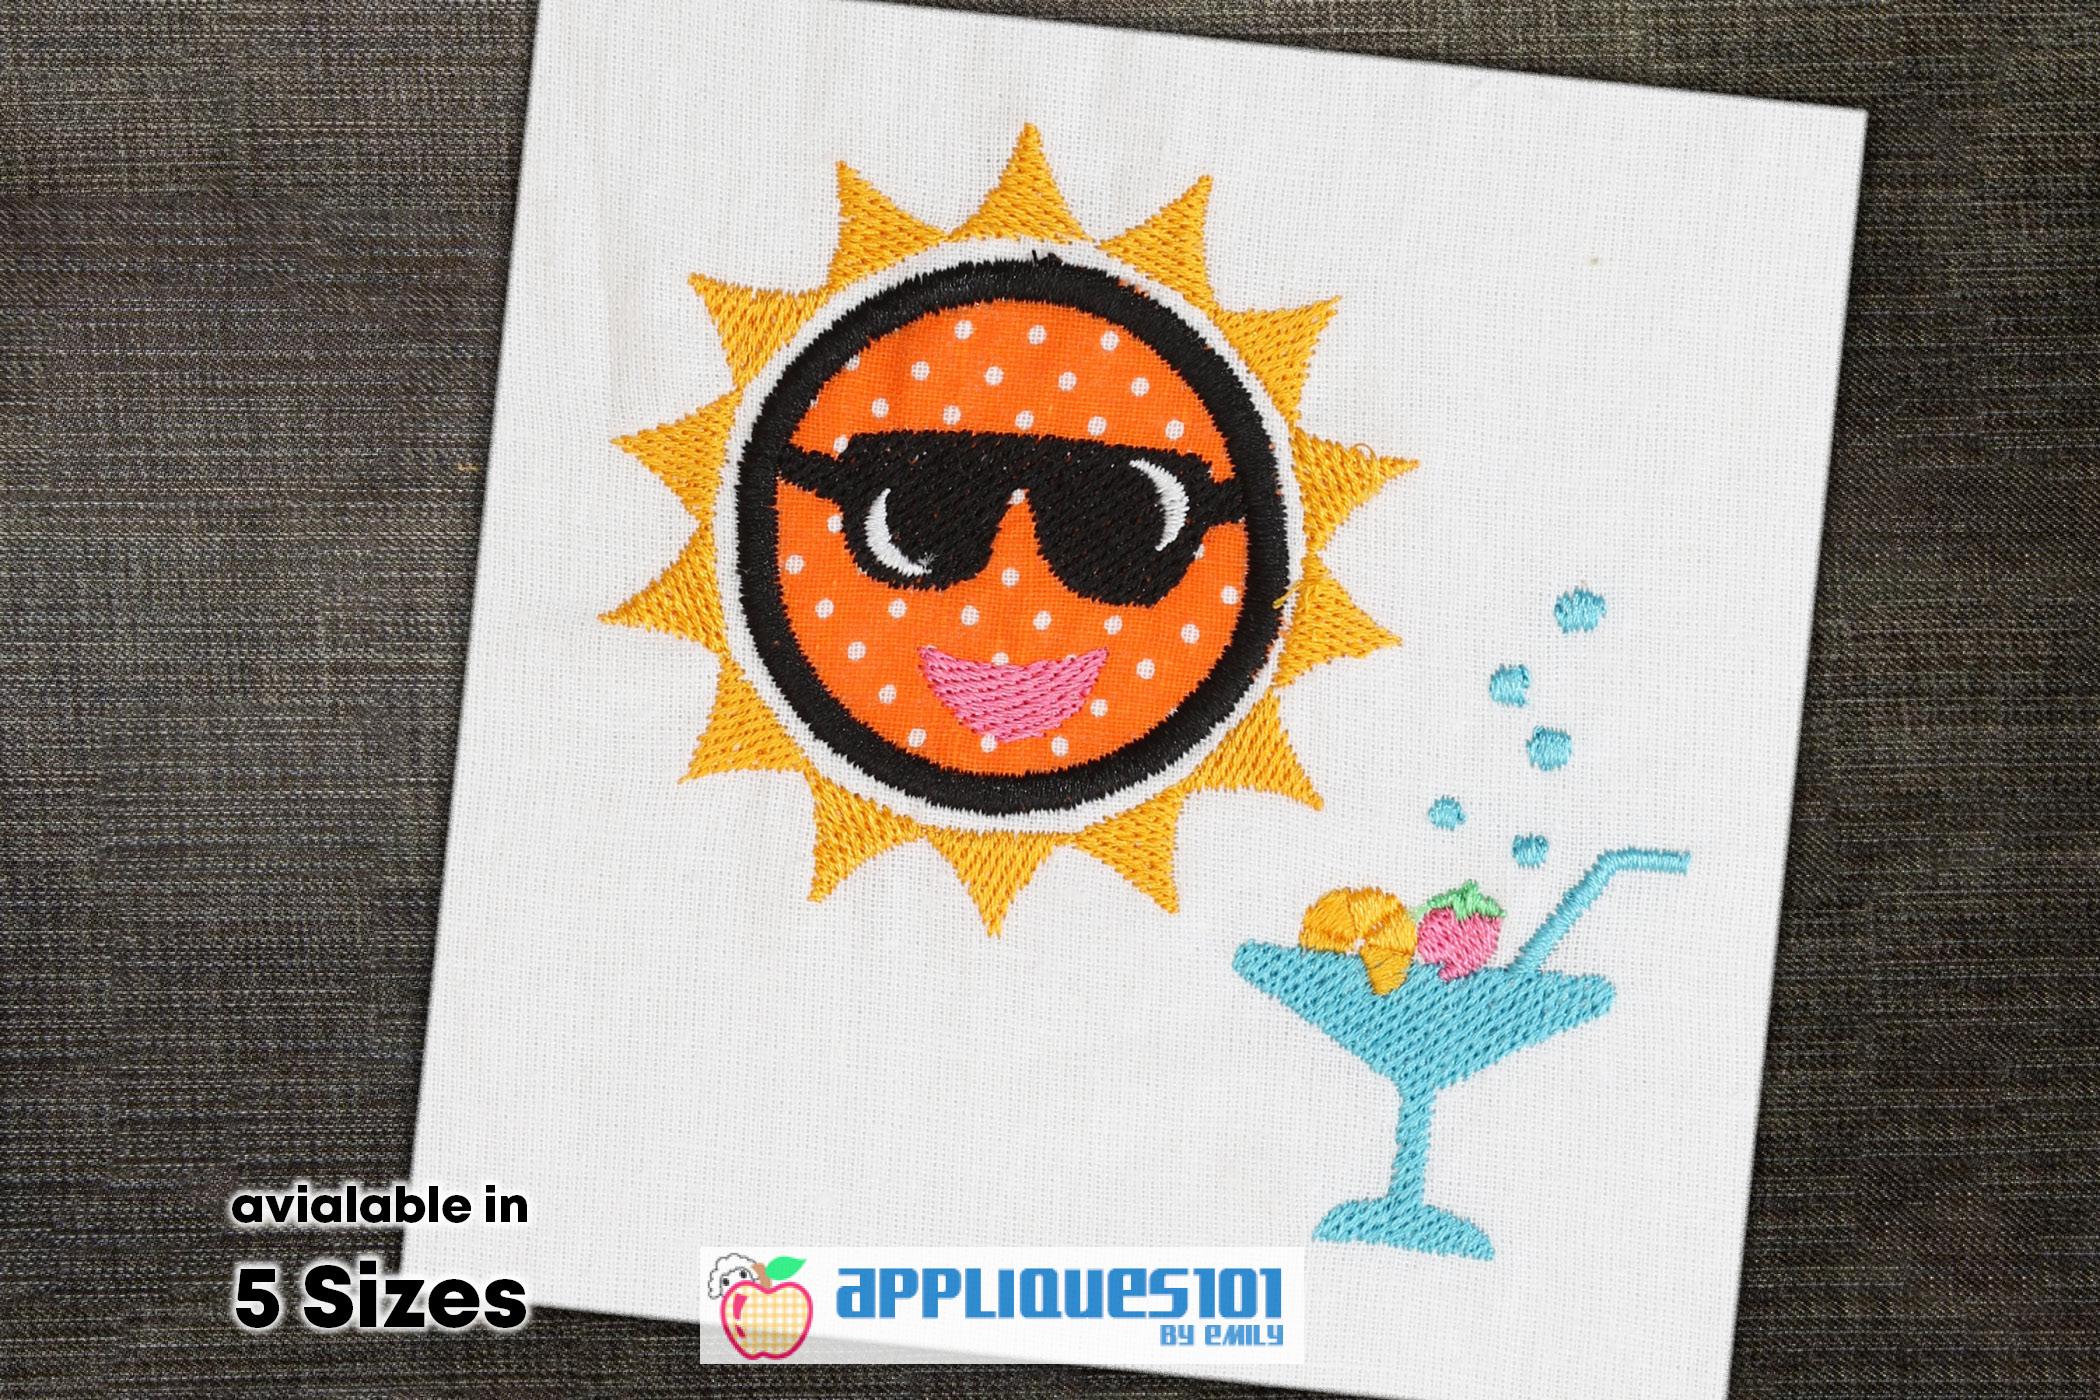 Sunglasses Embroidery Applique Design - Glasses example image 1